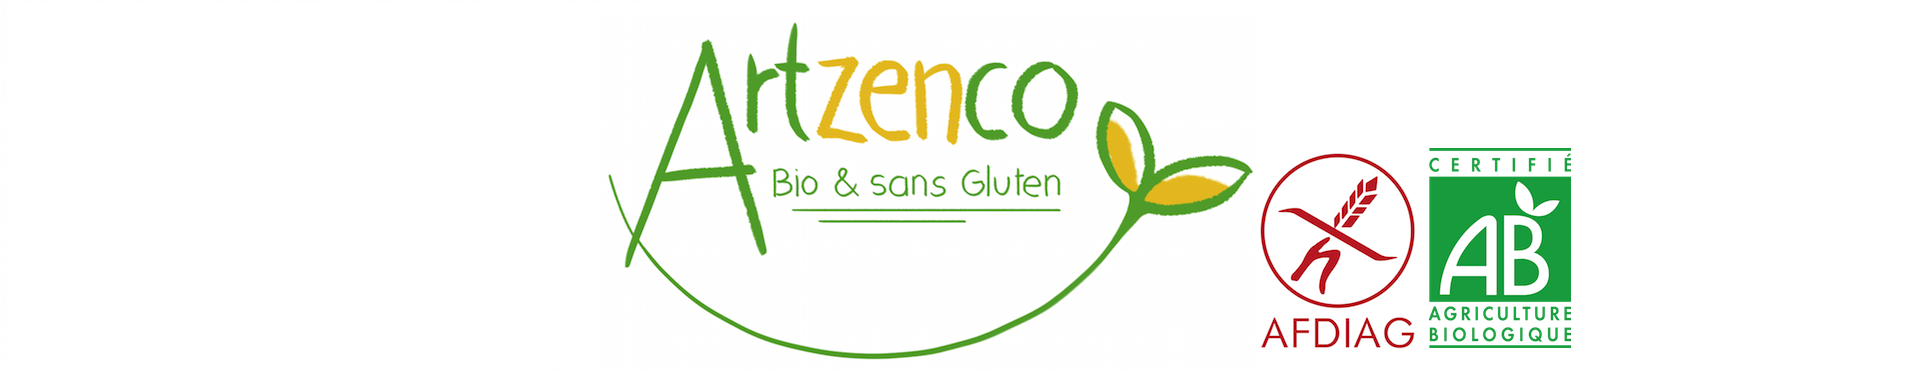 Artzenco